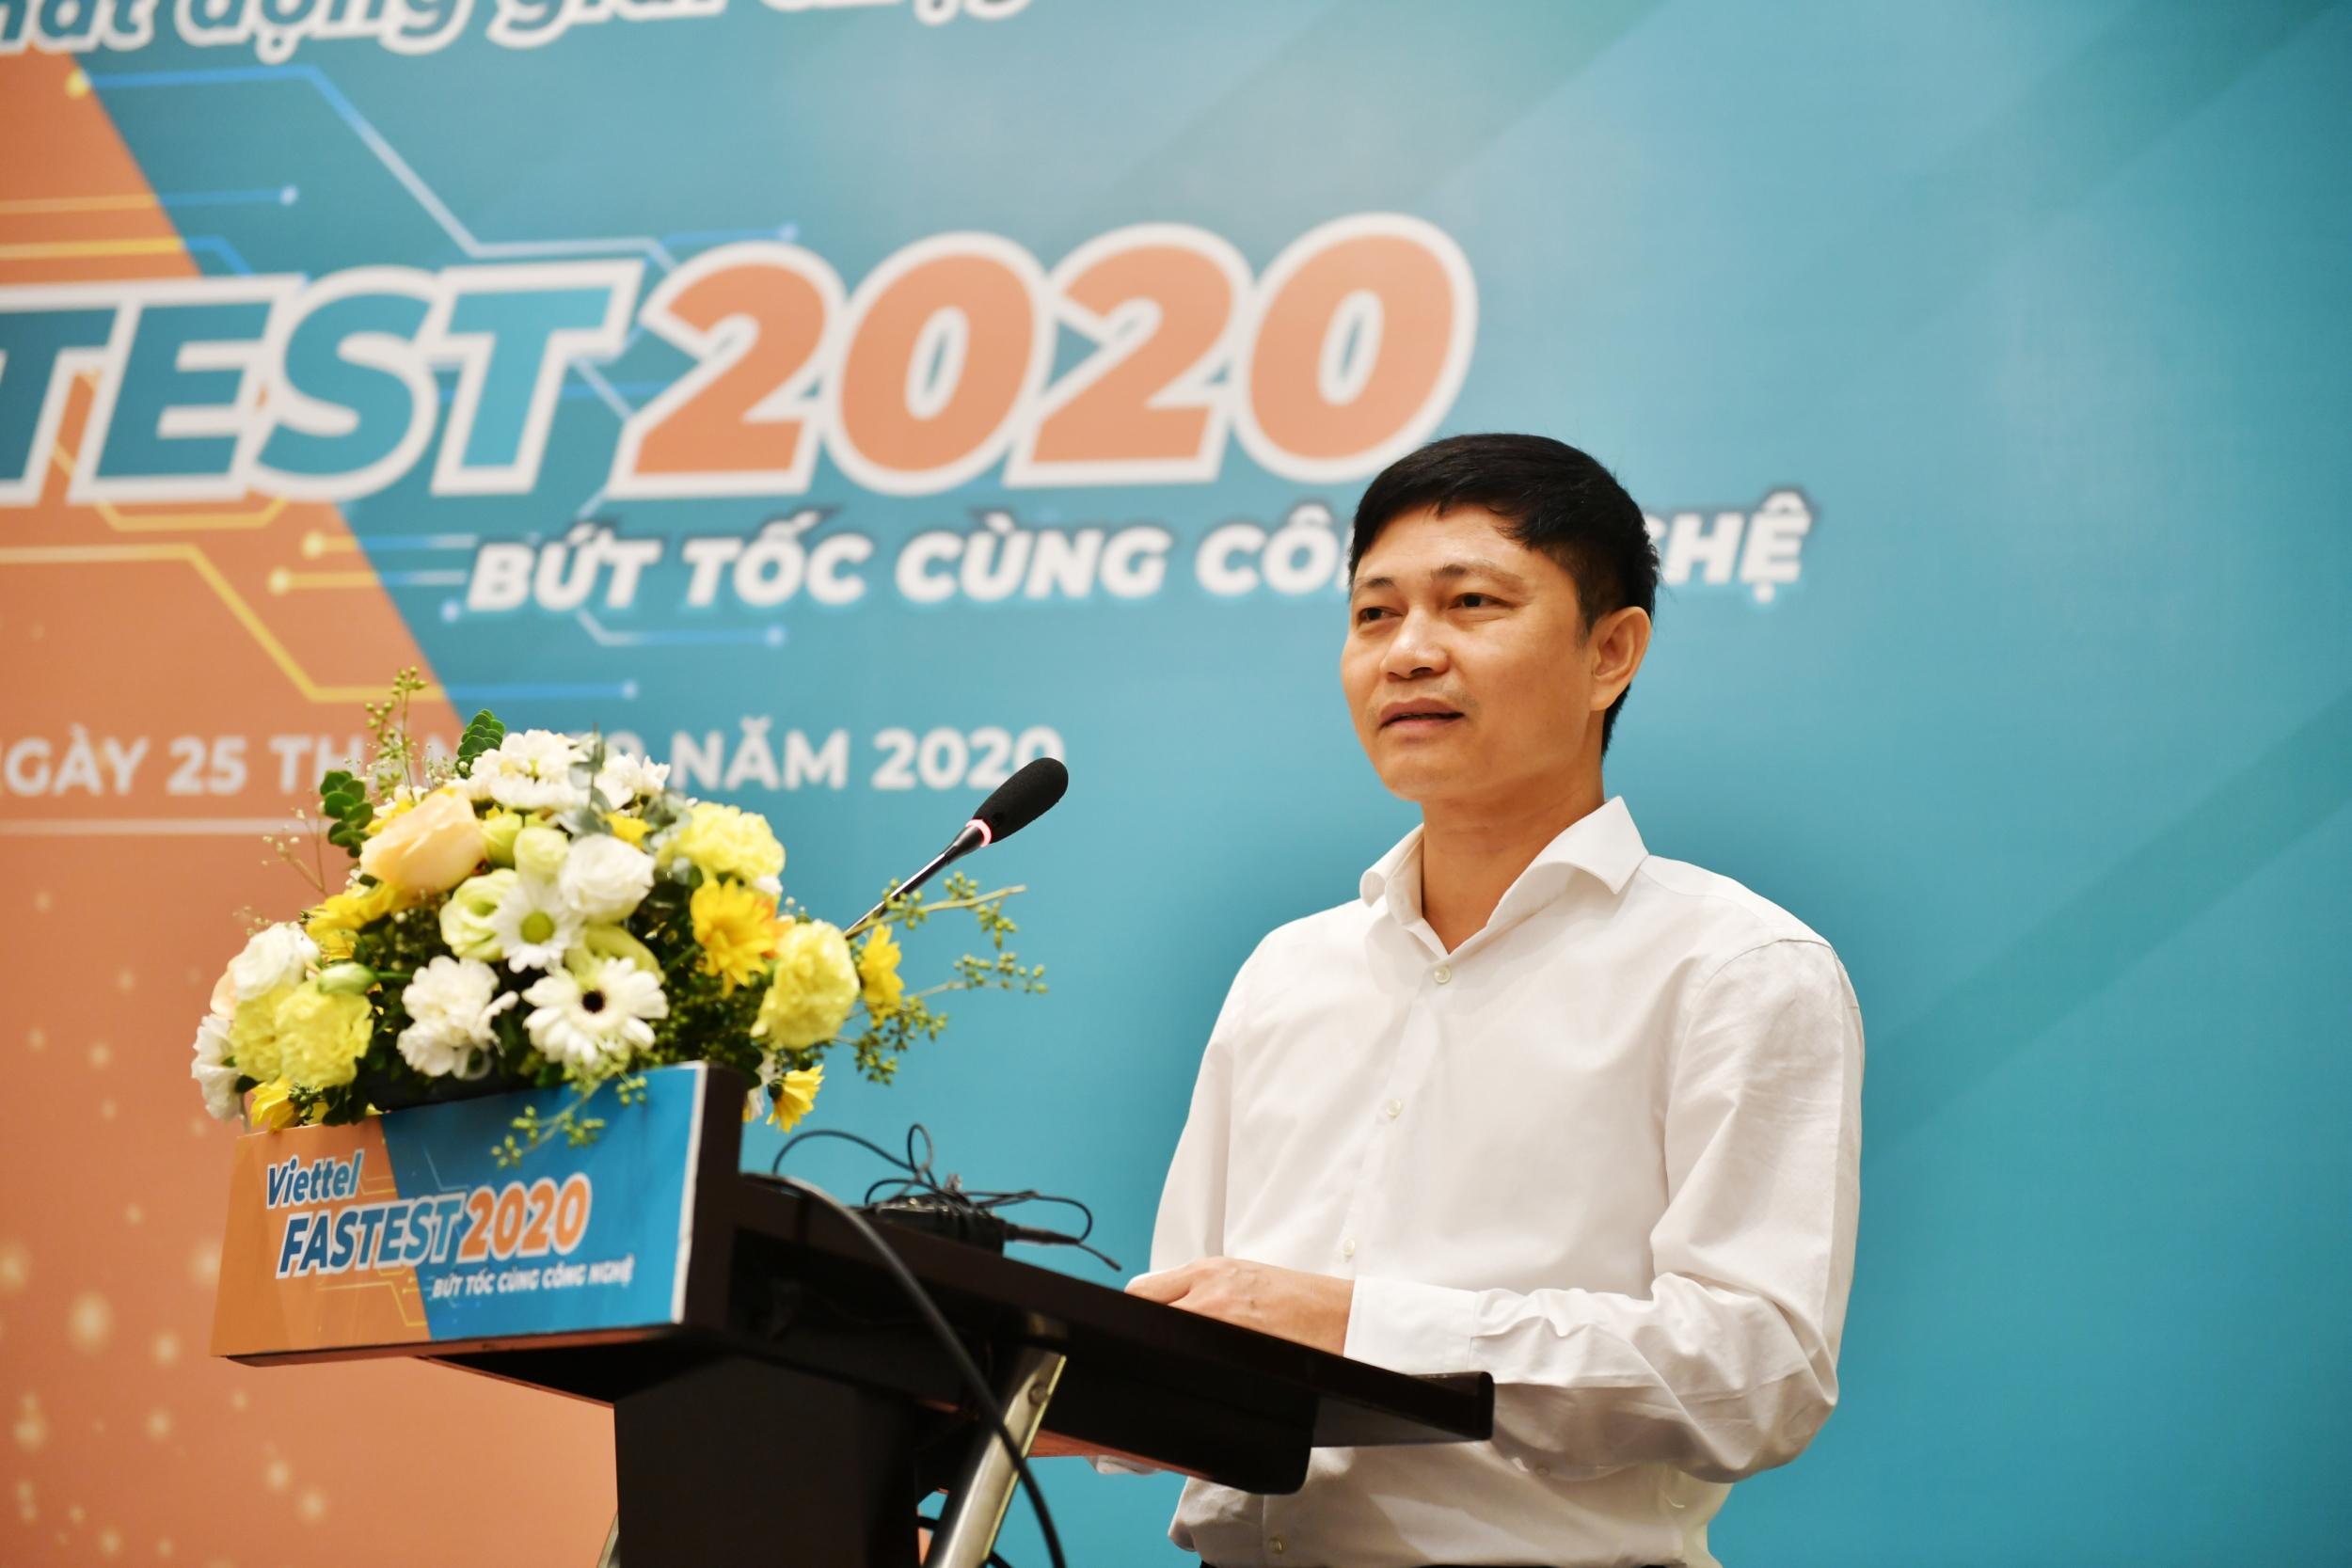 5701-ptgy-viettel-telecom-nguyen-thanh-nhuong